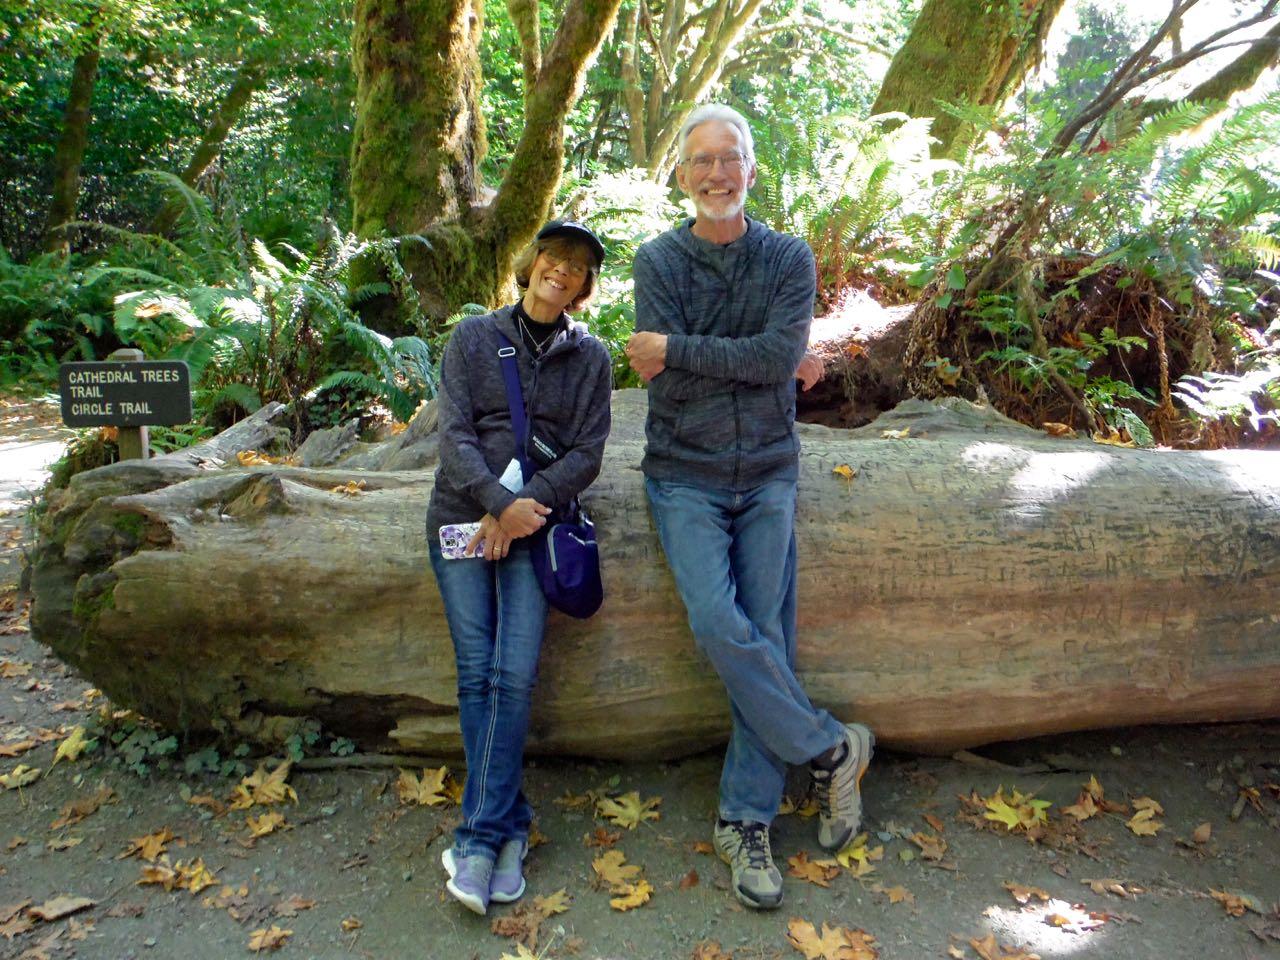 Redwoods 2017 10 01 228 Of 244